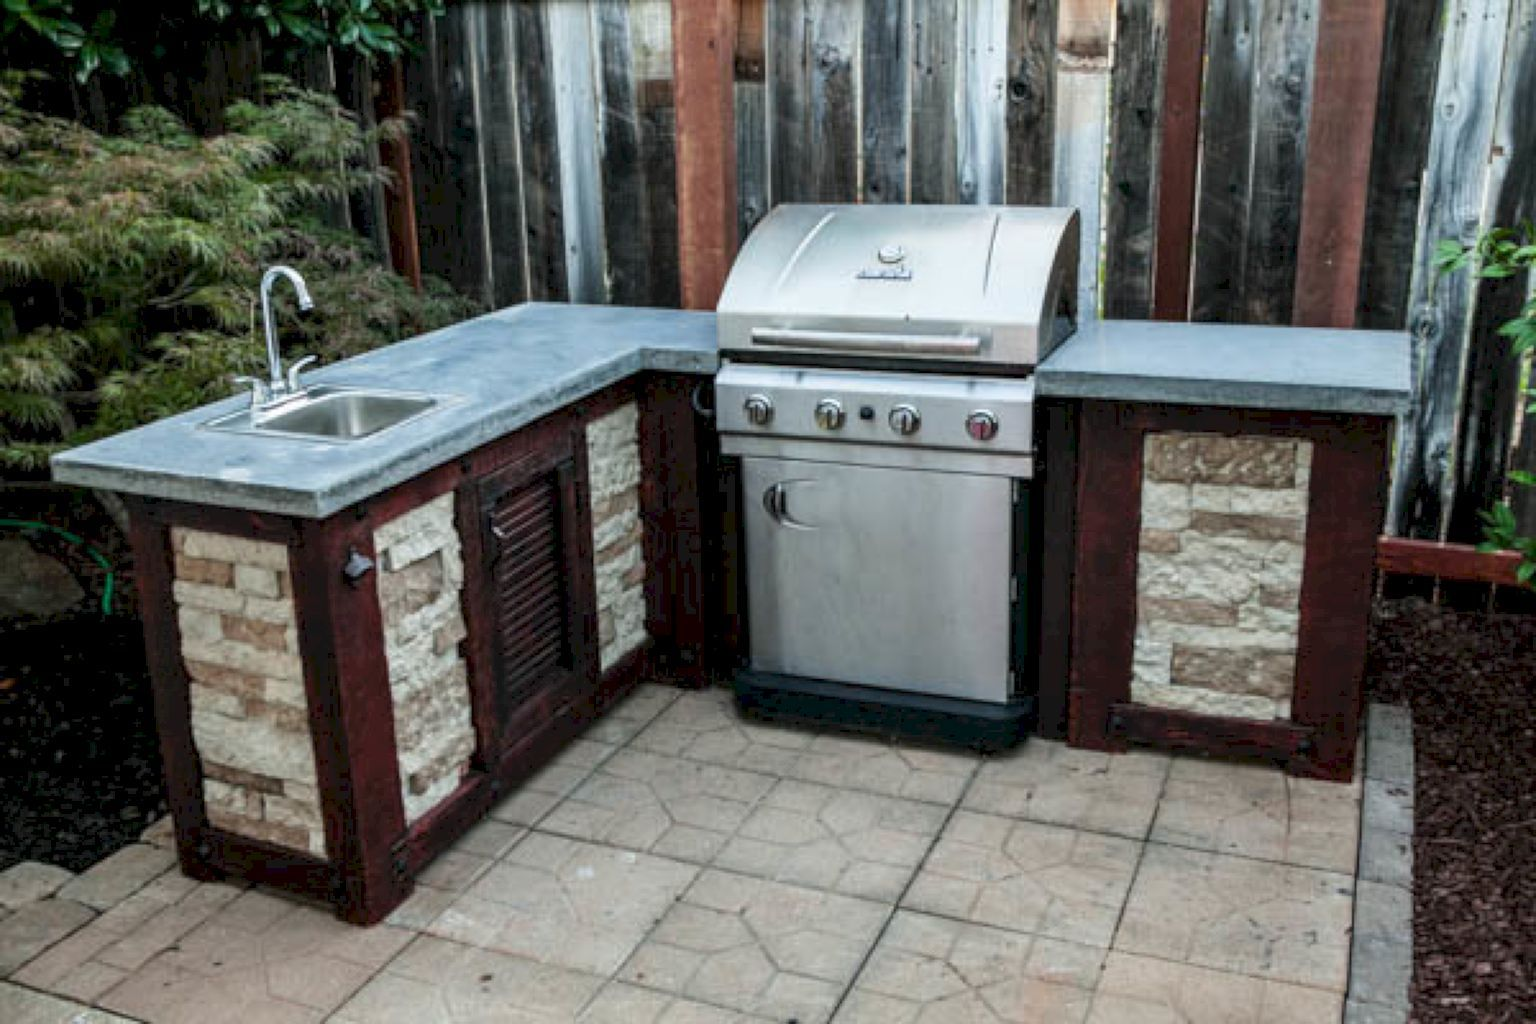 40 Gorgeous Outdoor Kitchen Design Ideas  Outdoor Kitchen Design Inspiration Build Your Own Outdoor Kitchen Decorating Inspiration